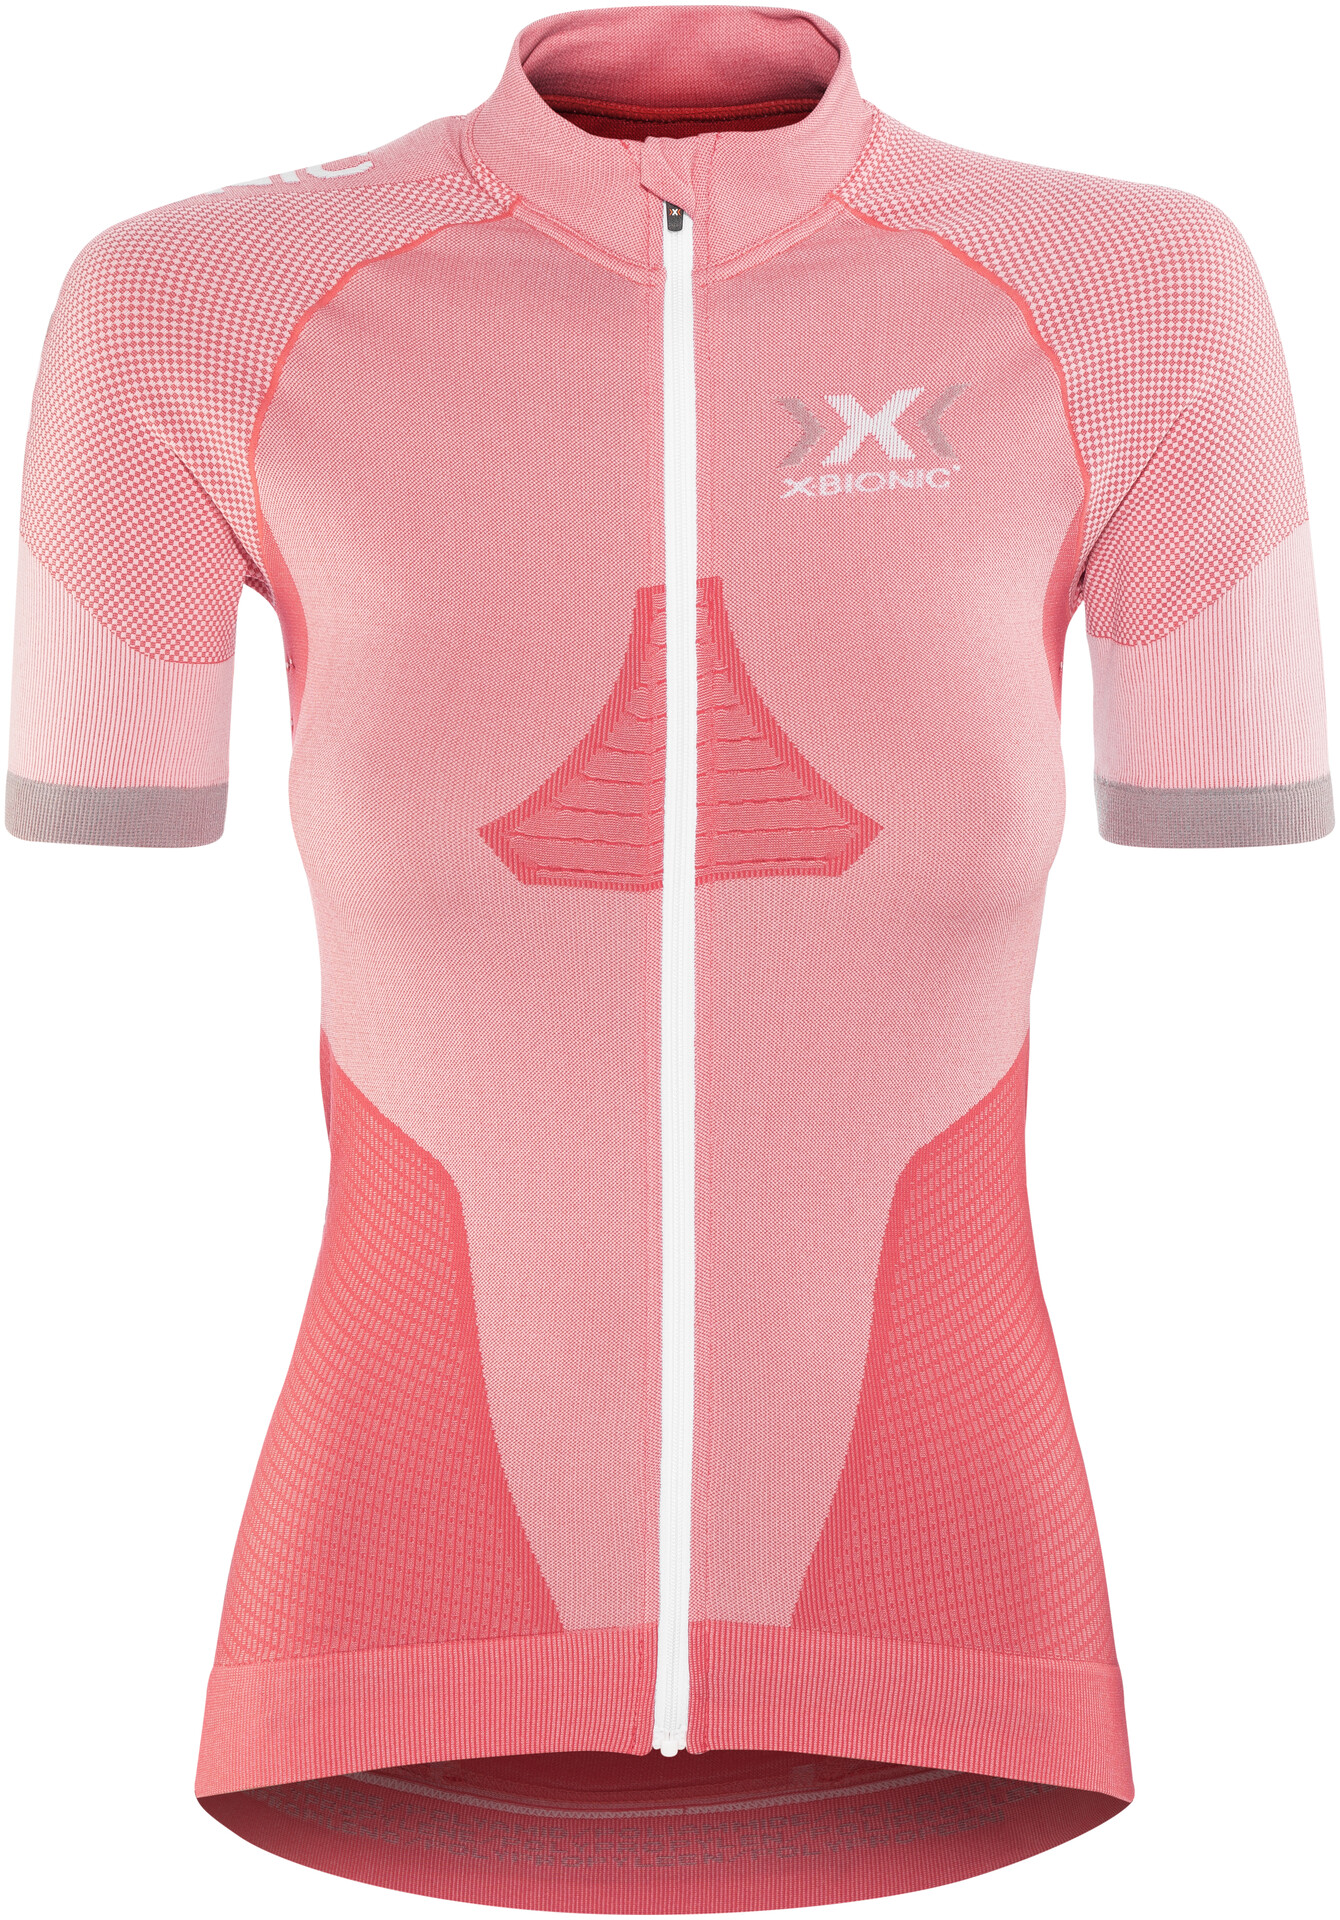 Mavic Sequence Damen Fahrrad Armlinge pink 2018